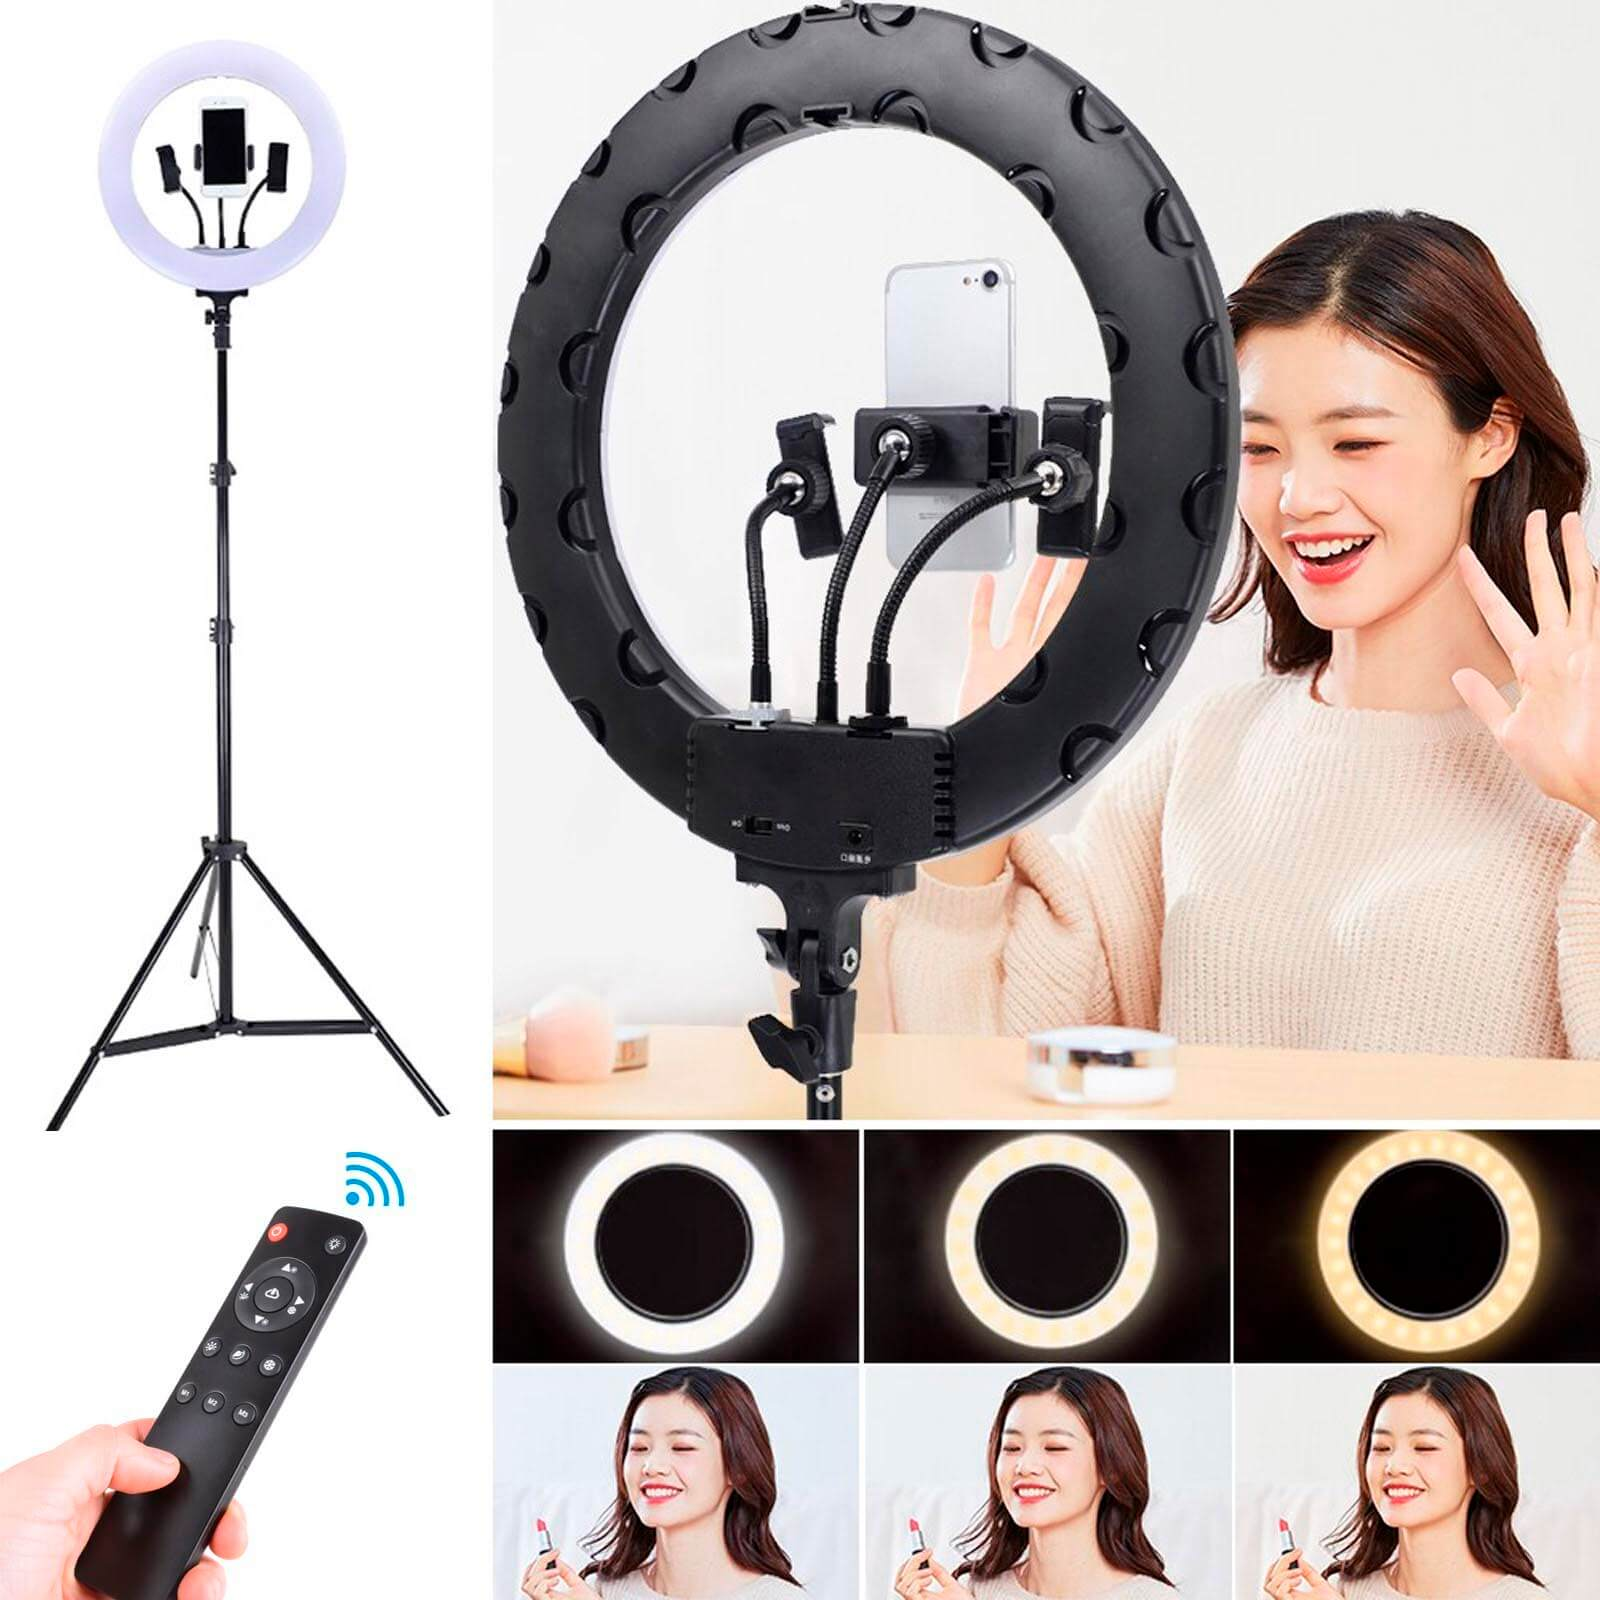 кольцевая лампа для фотосъемки купить